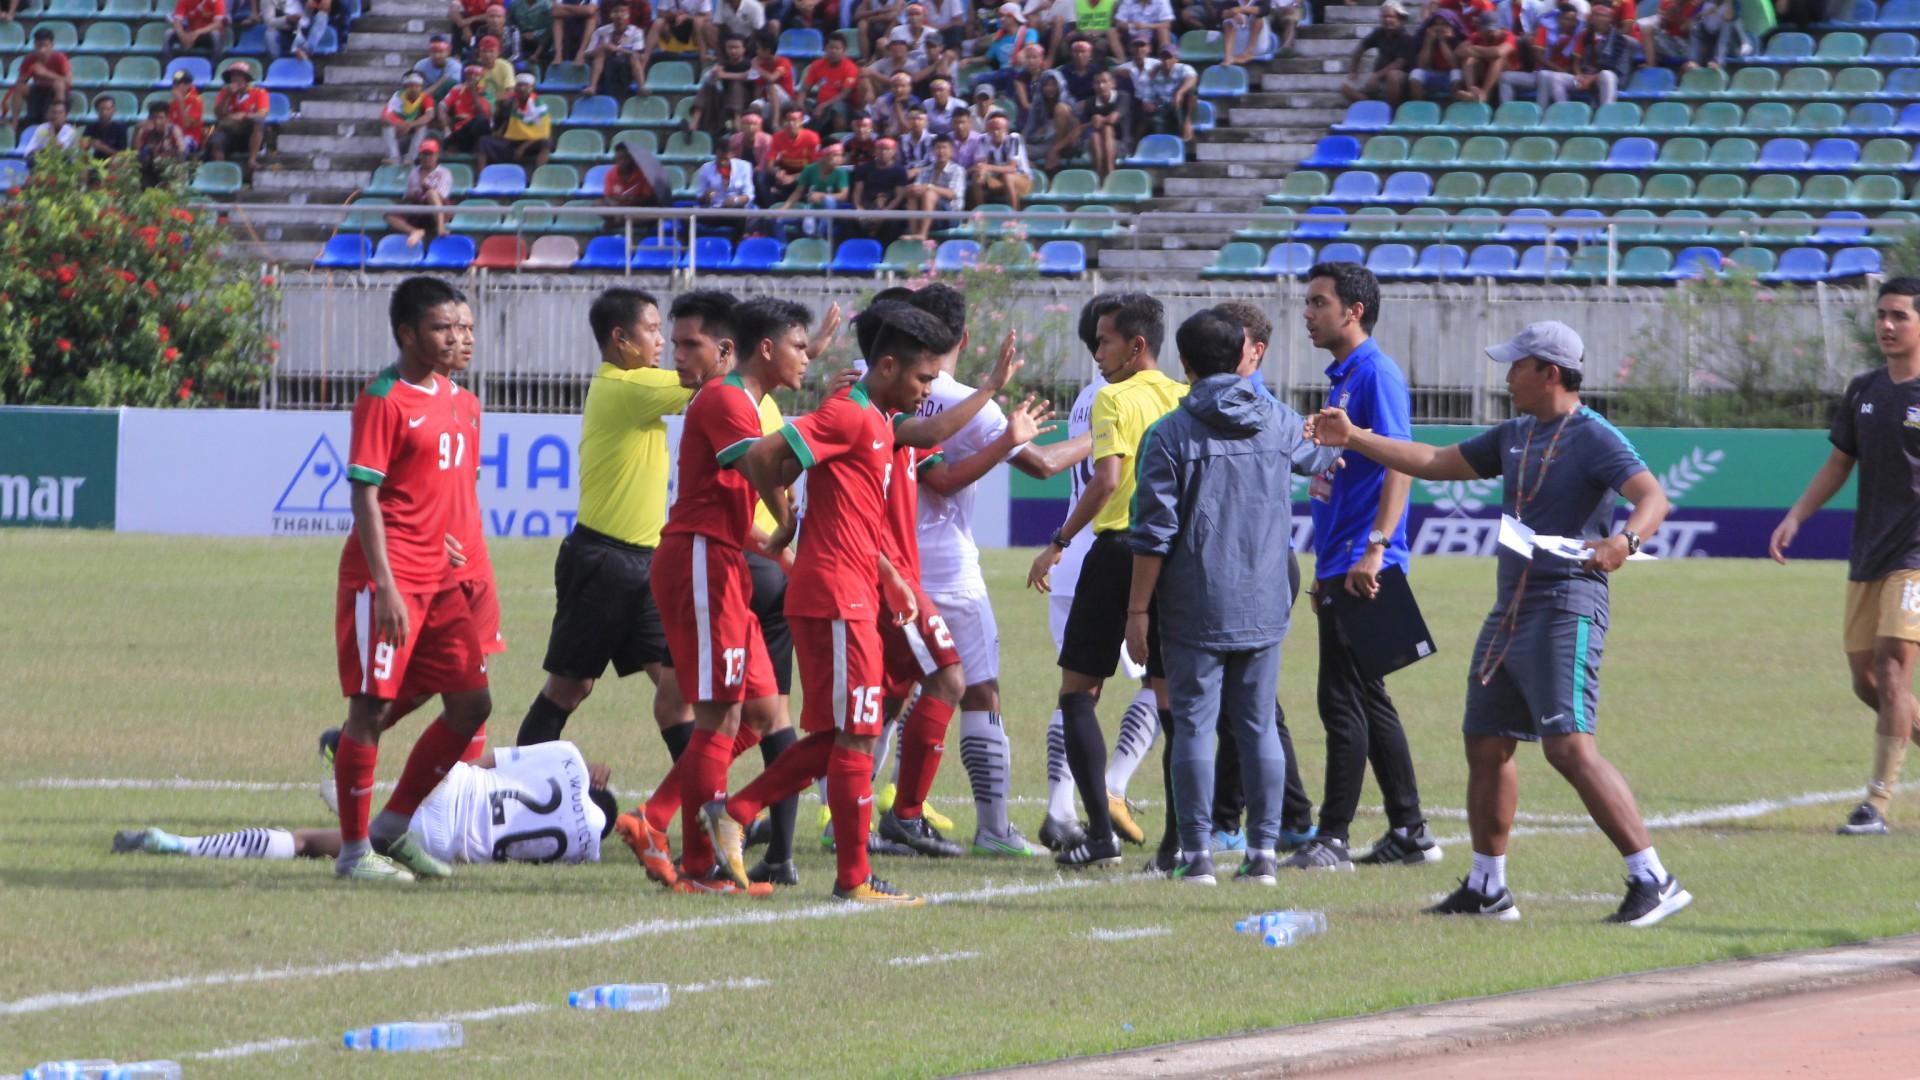 Saddil Ramdani - Timnas Indonesia U-19 Vs Thailand U-19